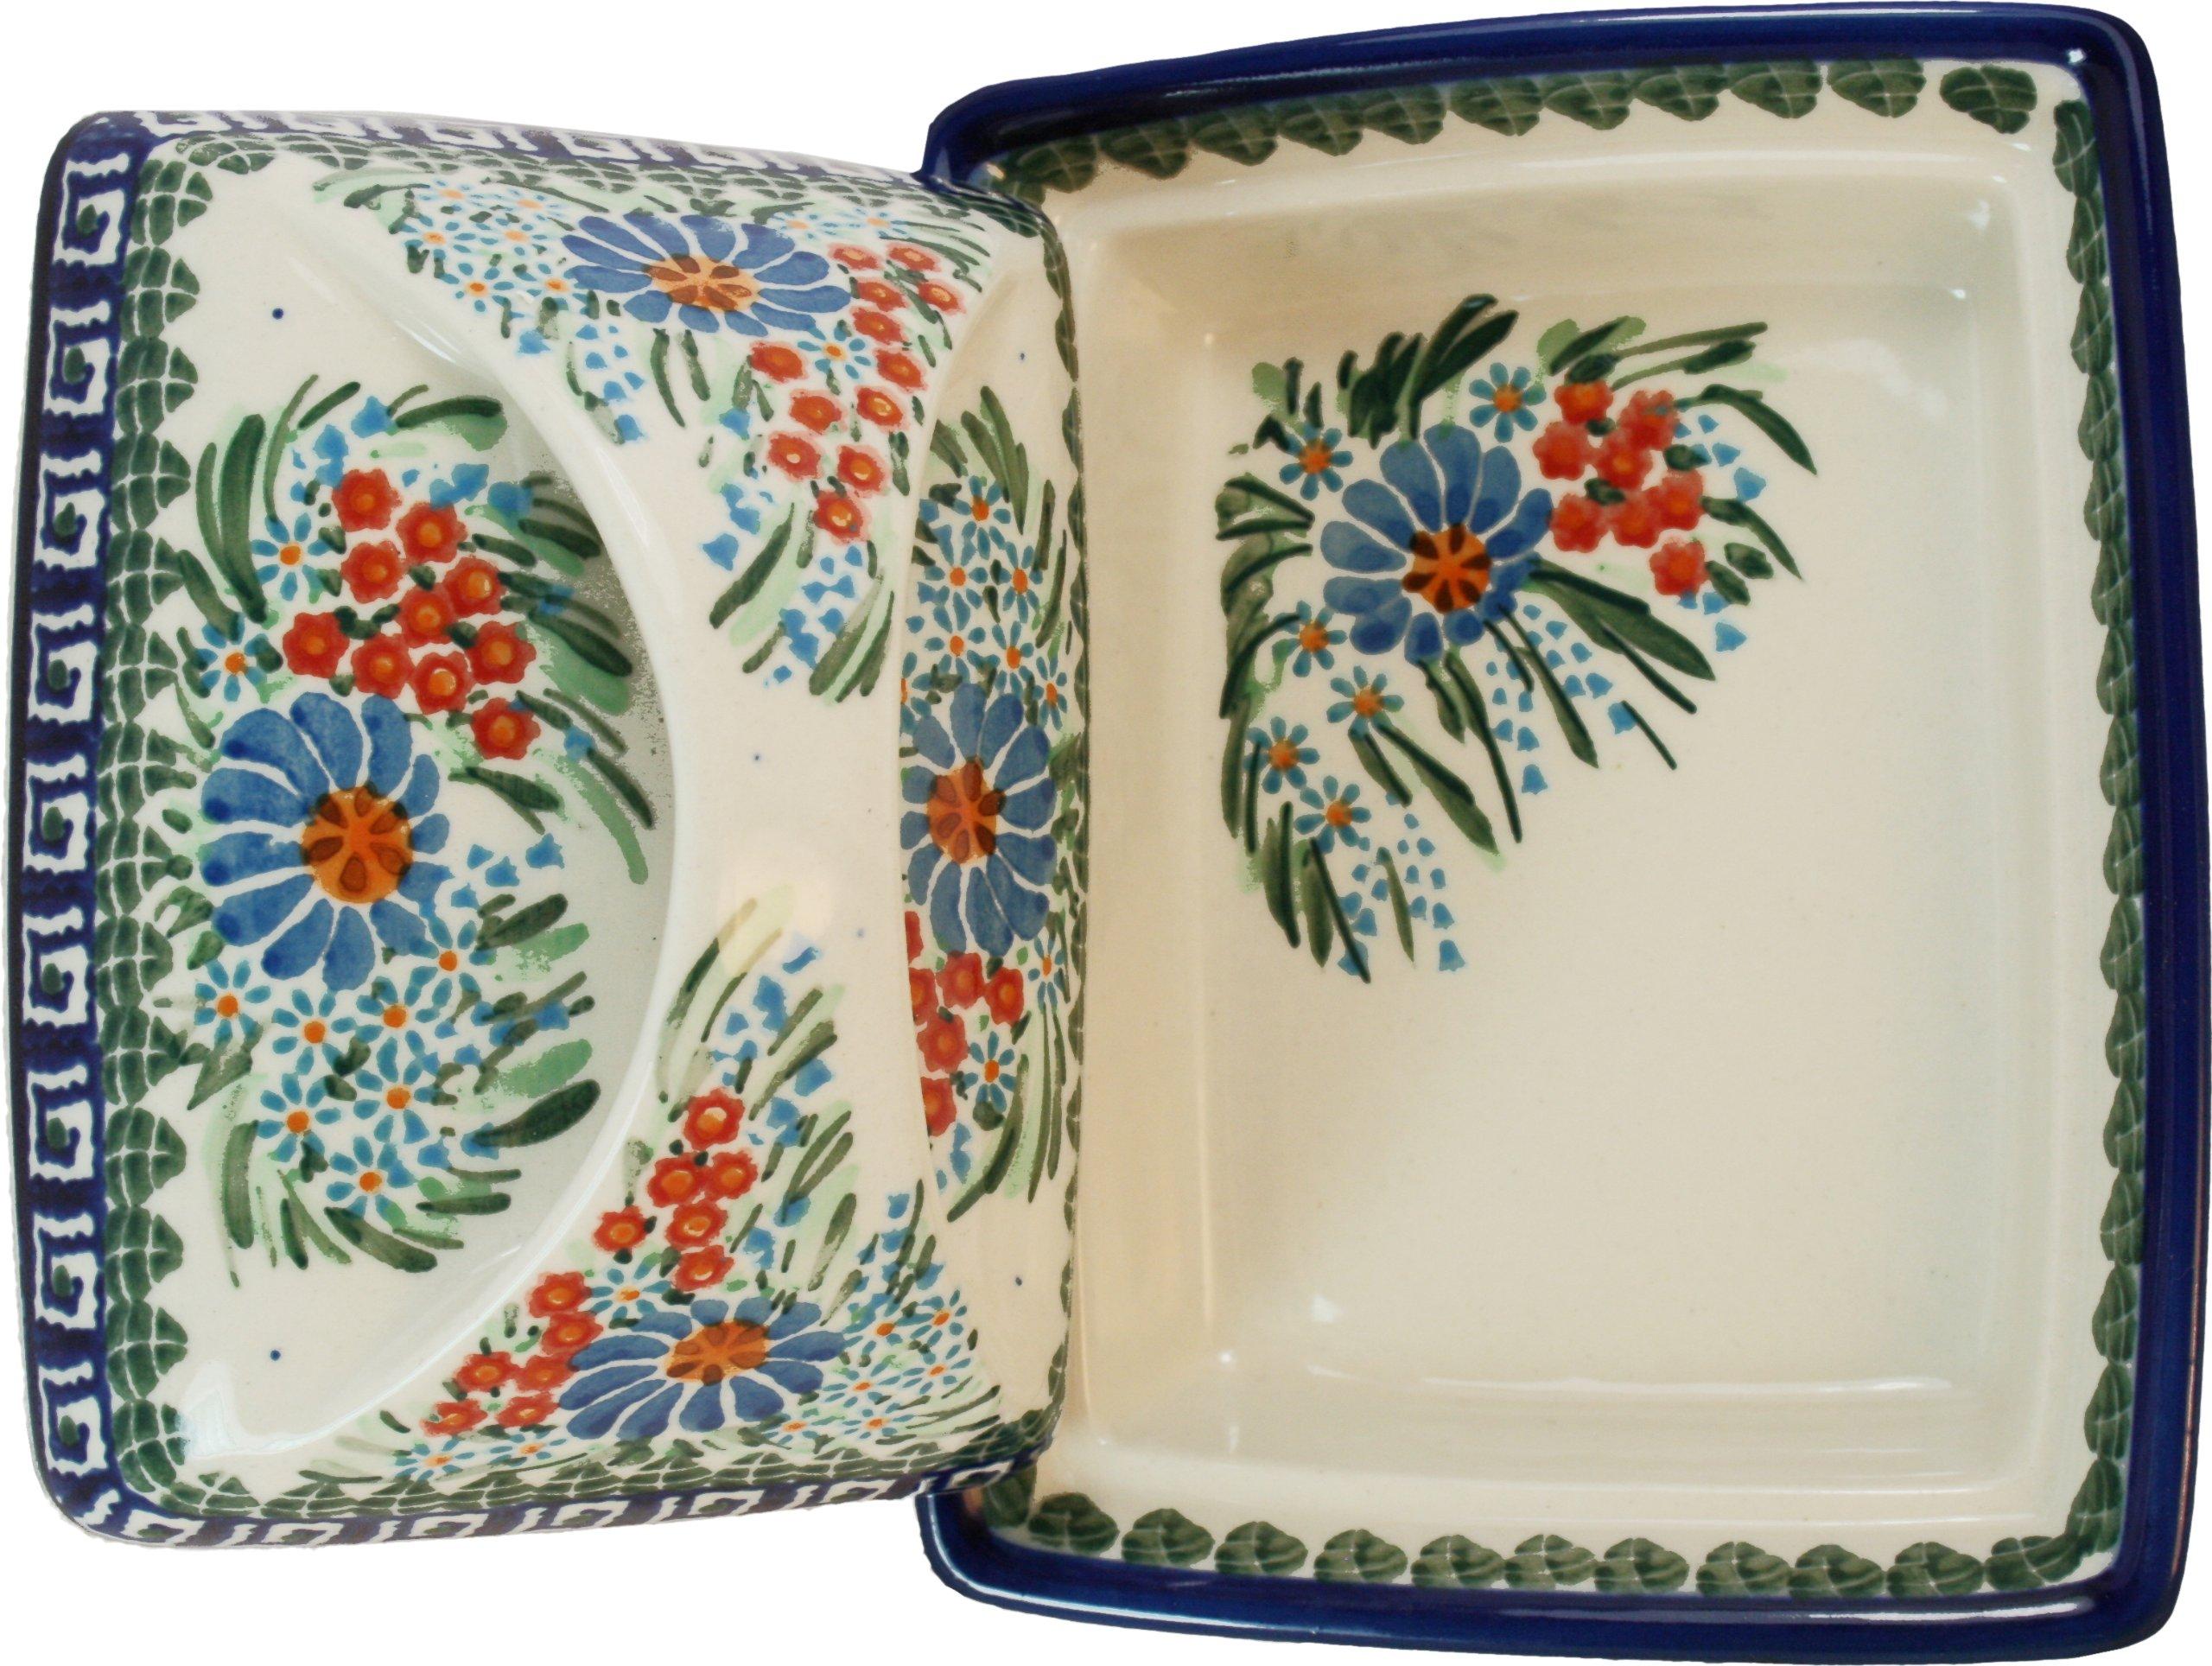 Polish Pottery Ceramika Boleslawiec 0352/169 Butter Deep Dish, 2 Cubes by Polish Pottery Ceramika Boleslawiec (Image #2)